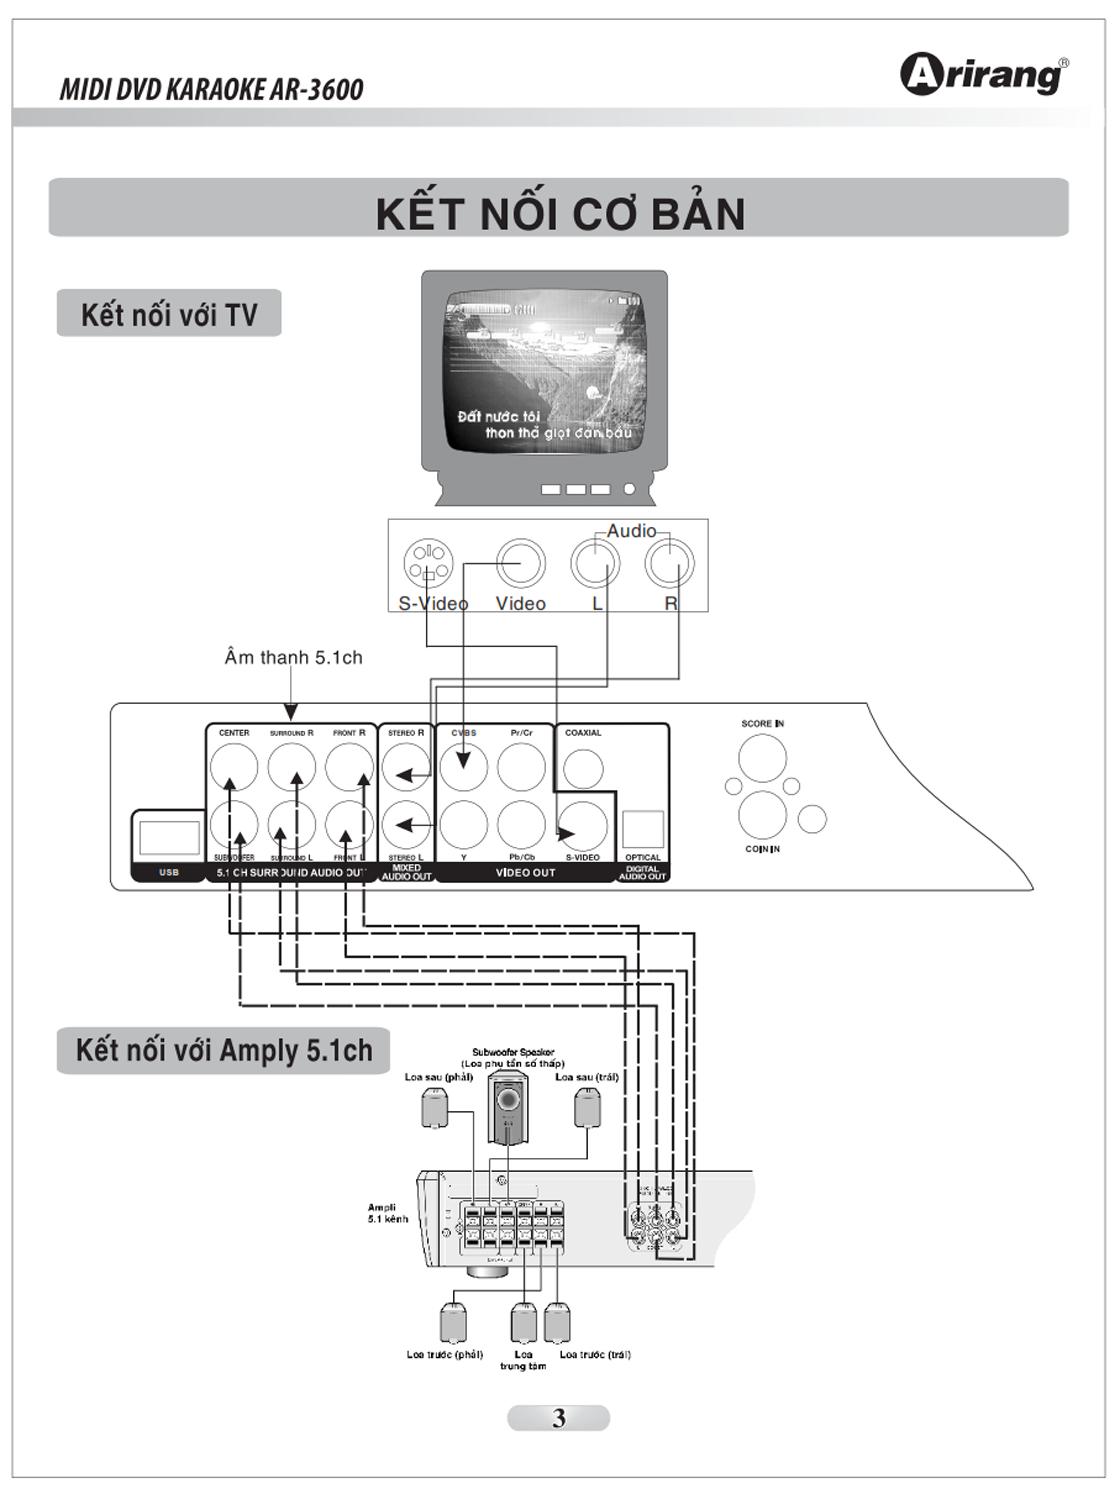 huong-dan-su-dung-amply-karaoke-arirang-AR-3600-vn_004.png